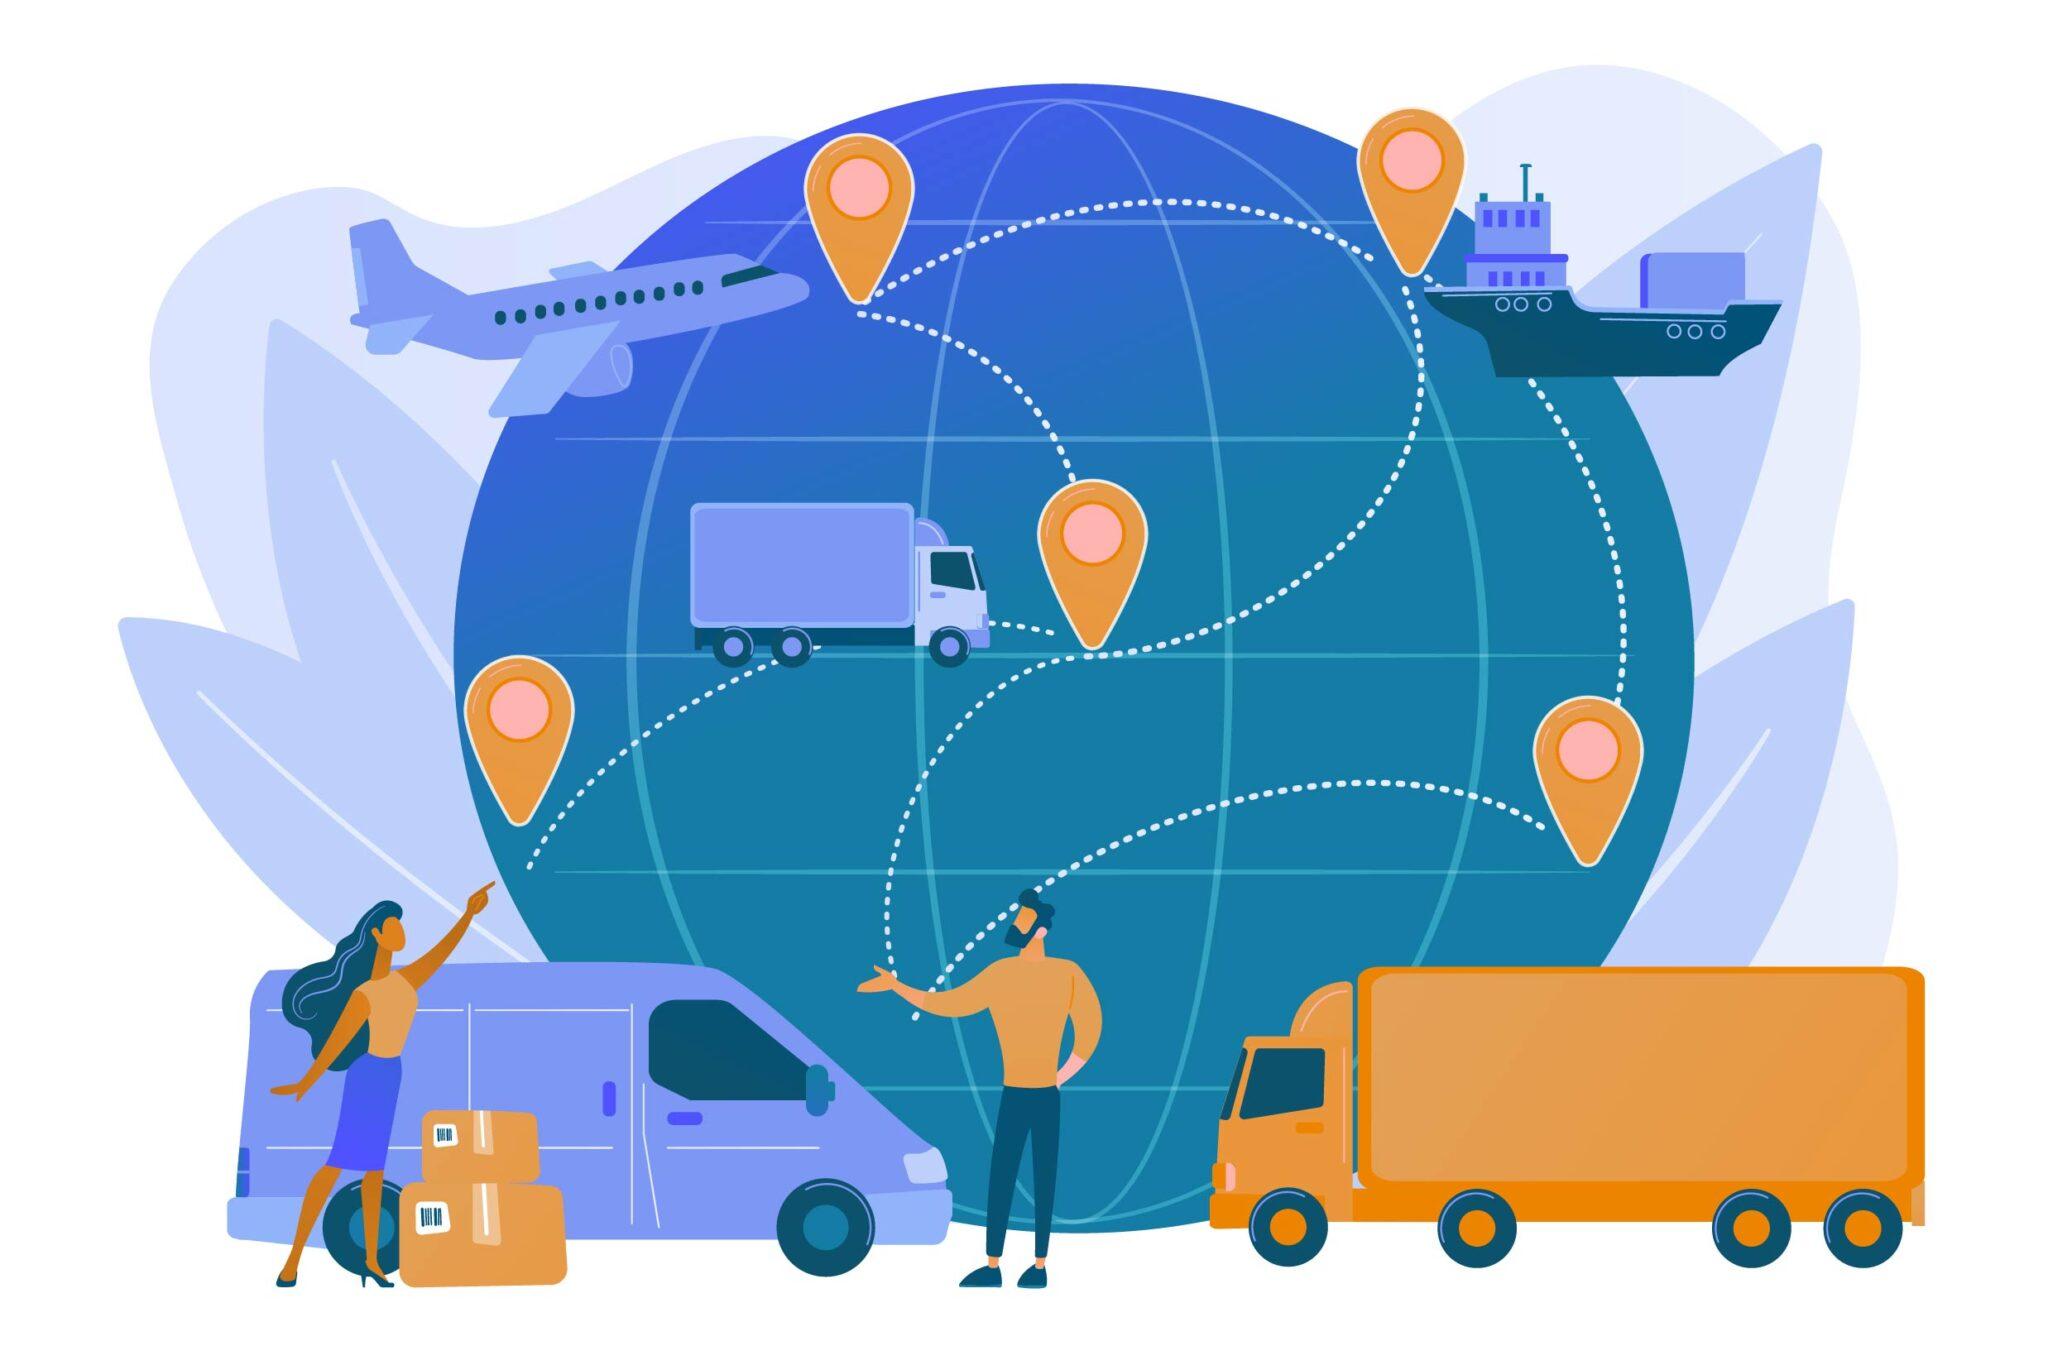 Real-time transportation visibility platforms